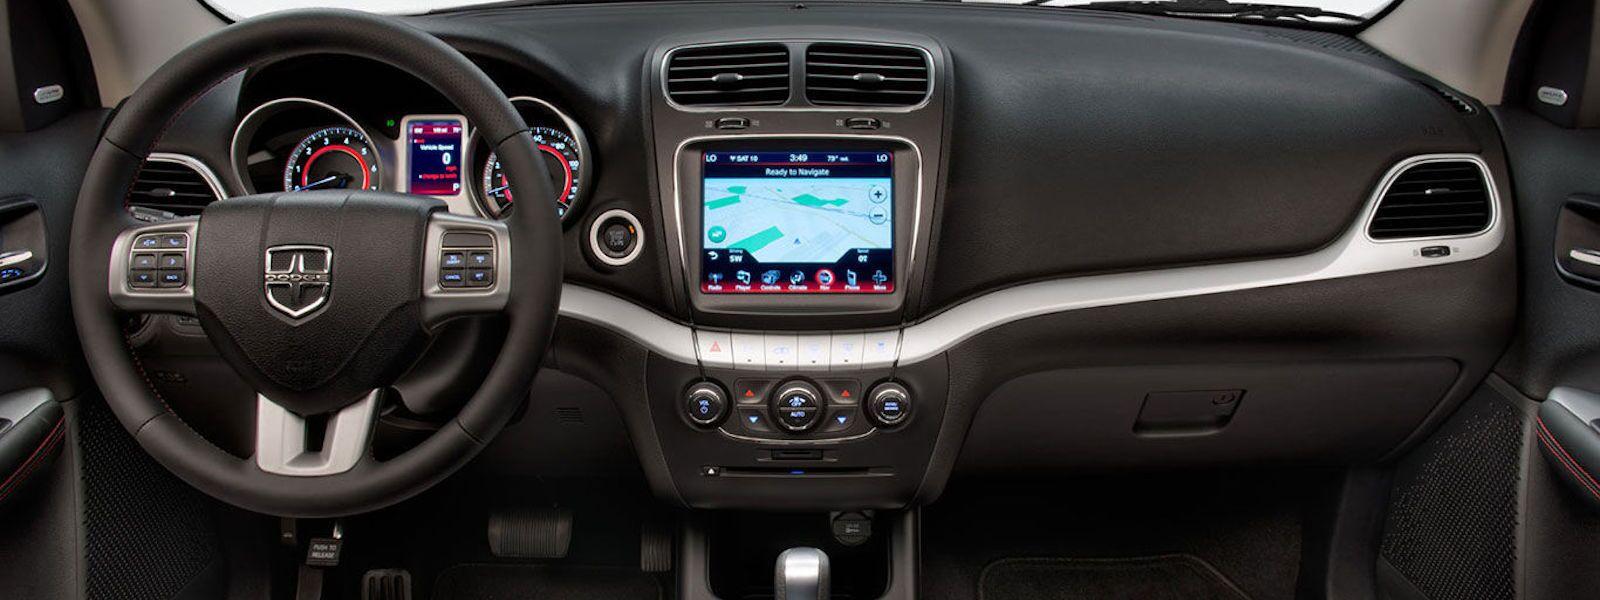 2016 Dodge Journey Technology